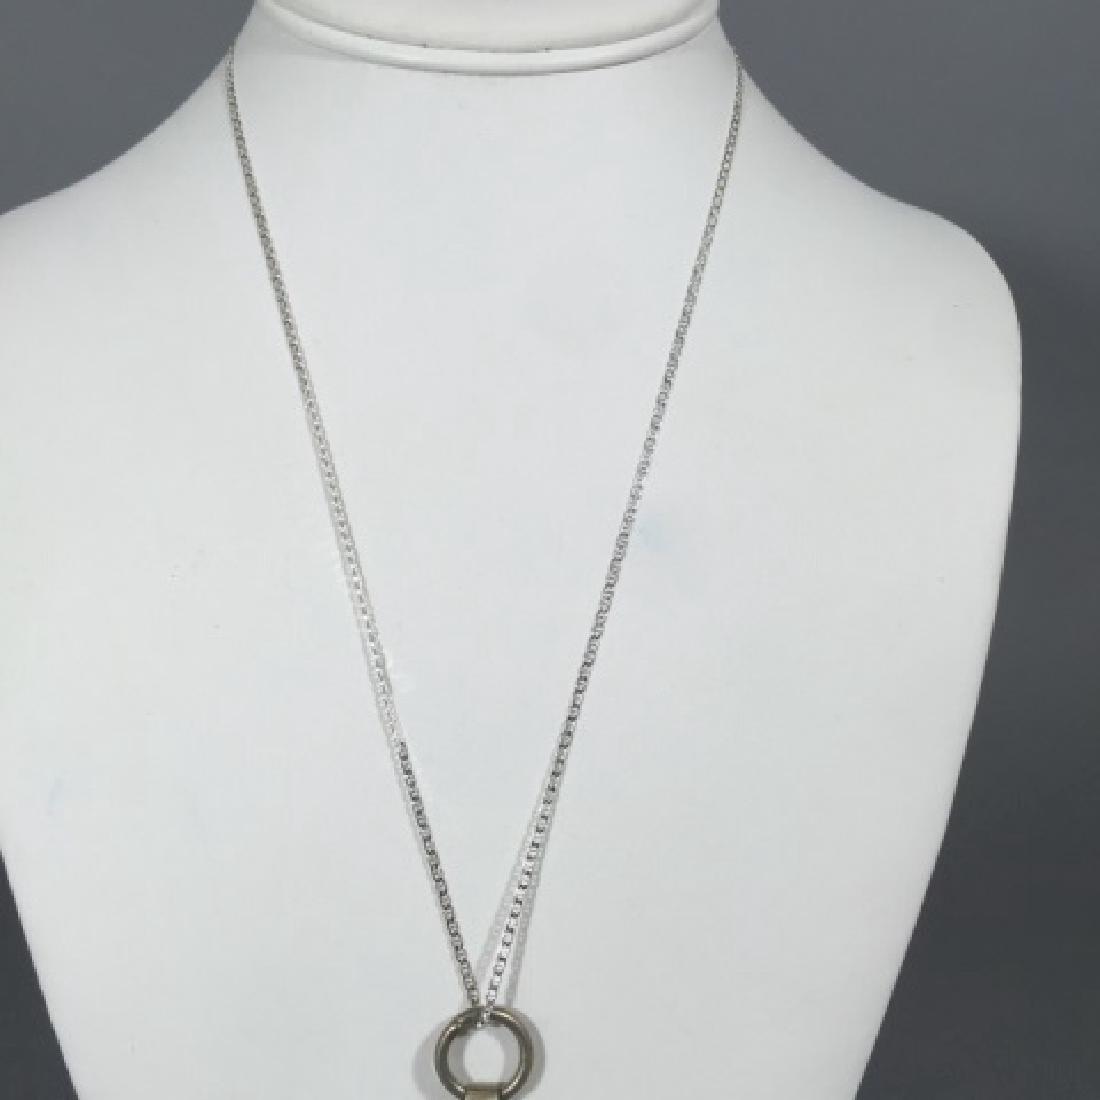 Filigree & Enamel Pendant on Sterling Silver Chain - 4